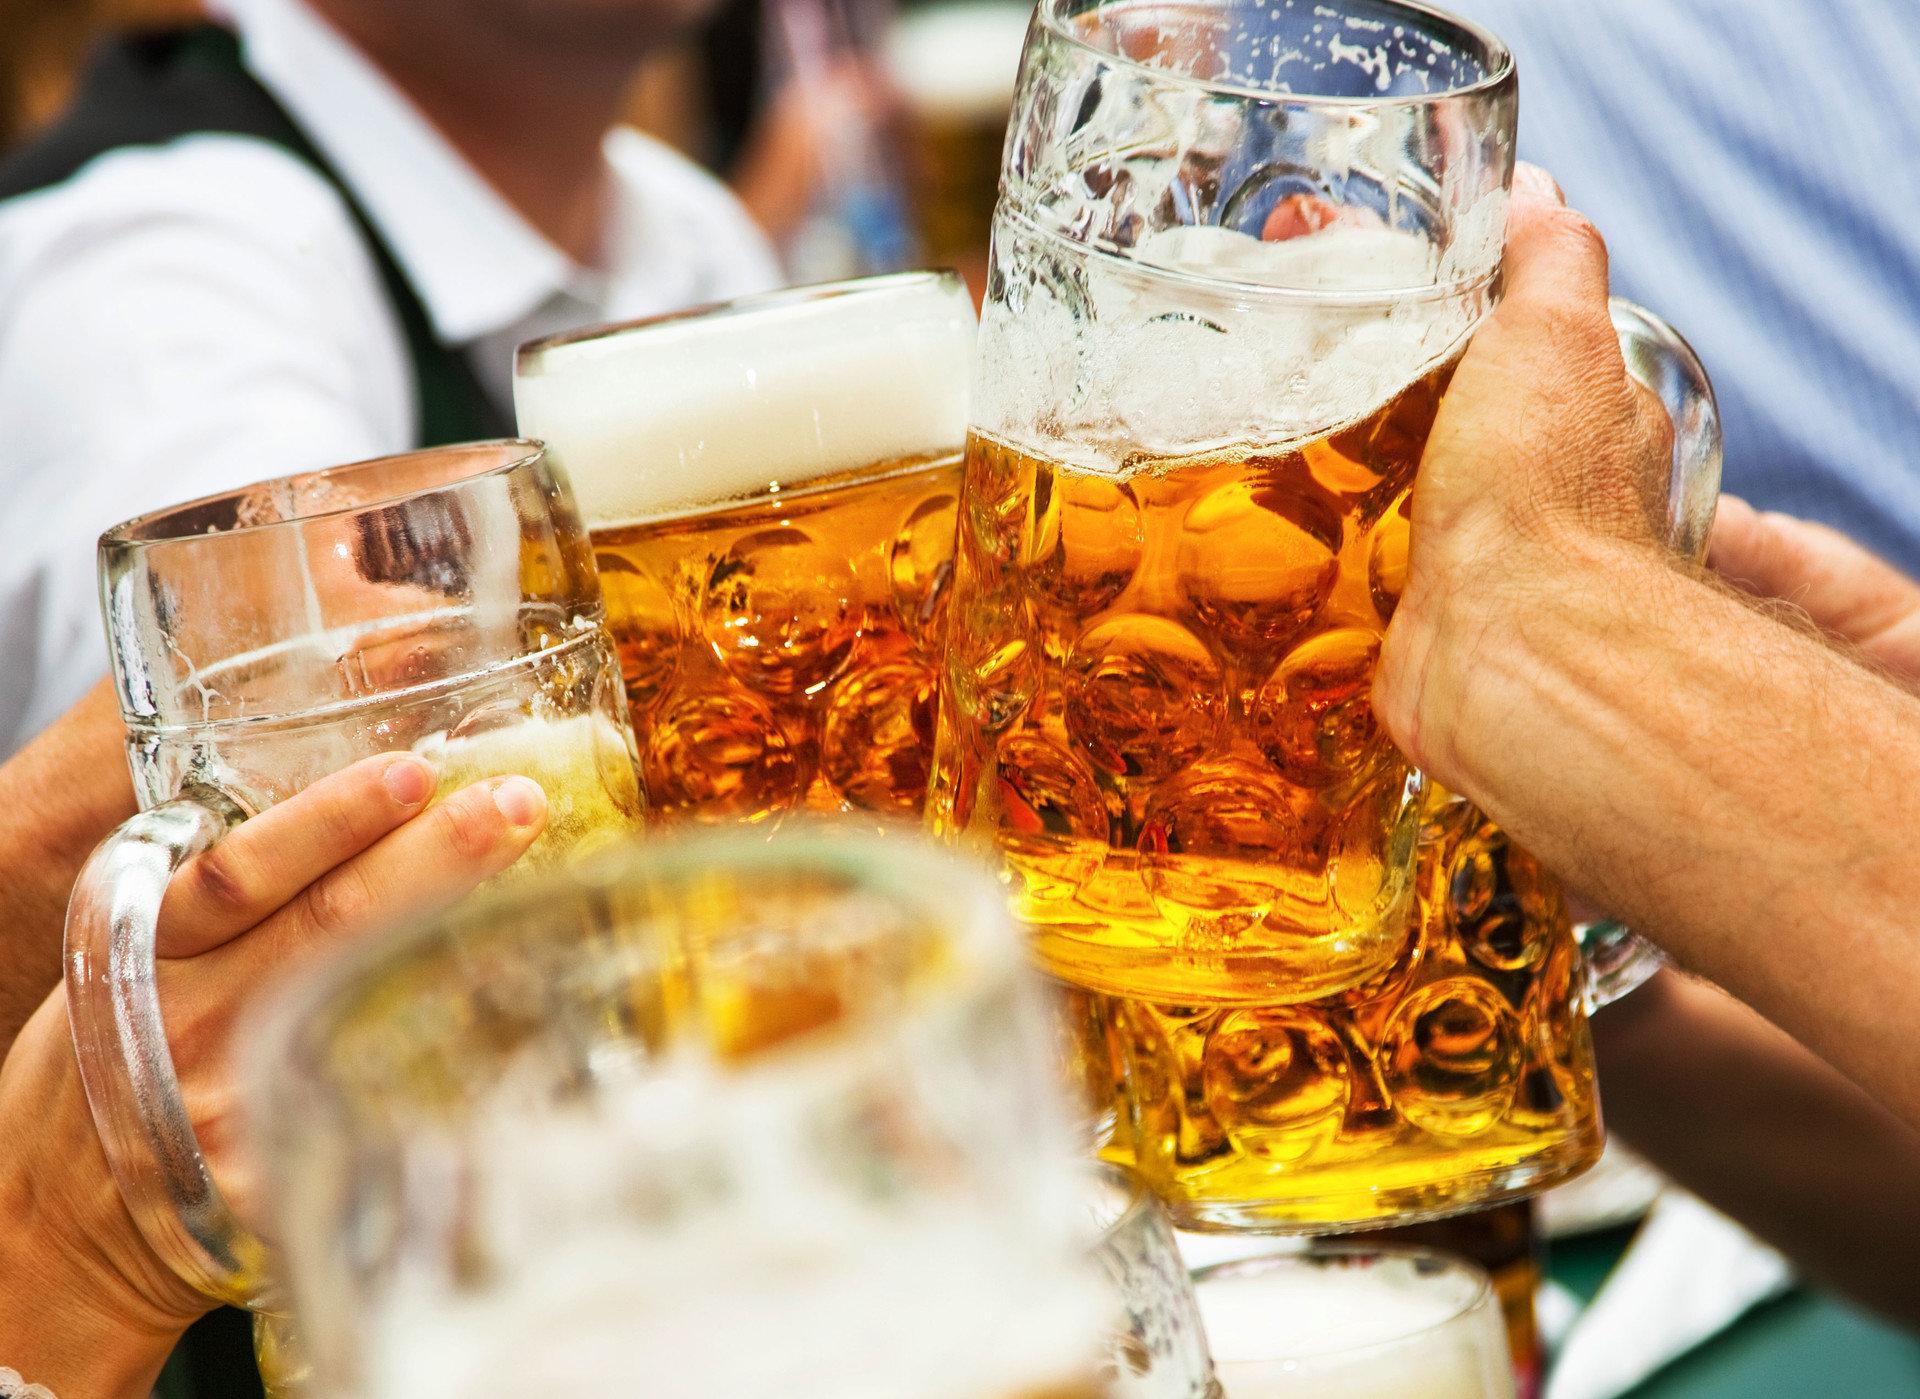 Arts + Culture Fall Travel Festivals + Events Offbeat oktoberfest Trip Ideas person table Drink alcohol sense distilled beverage